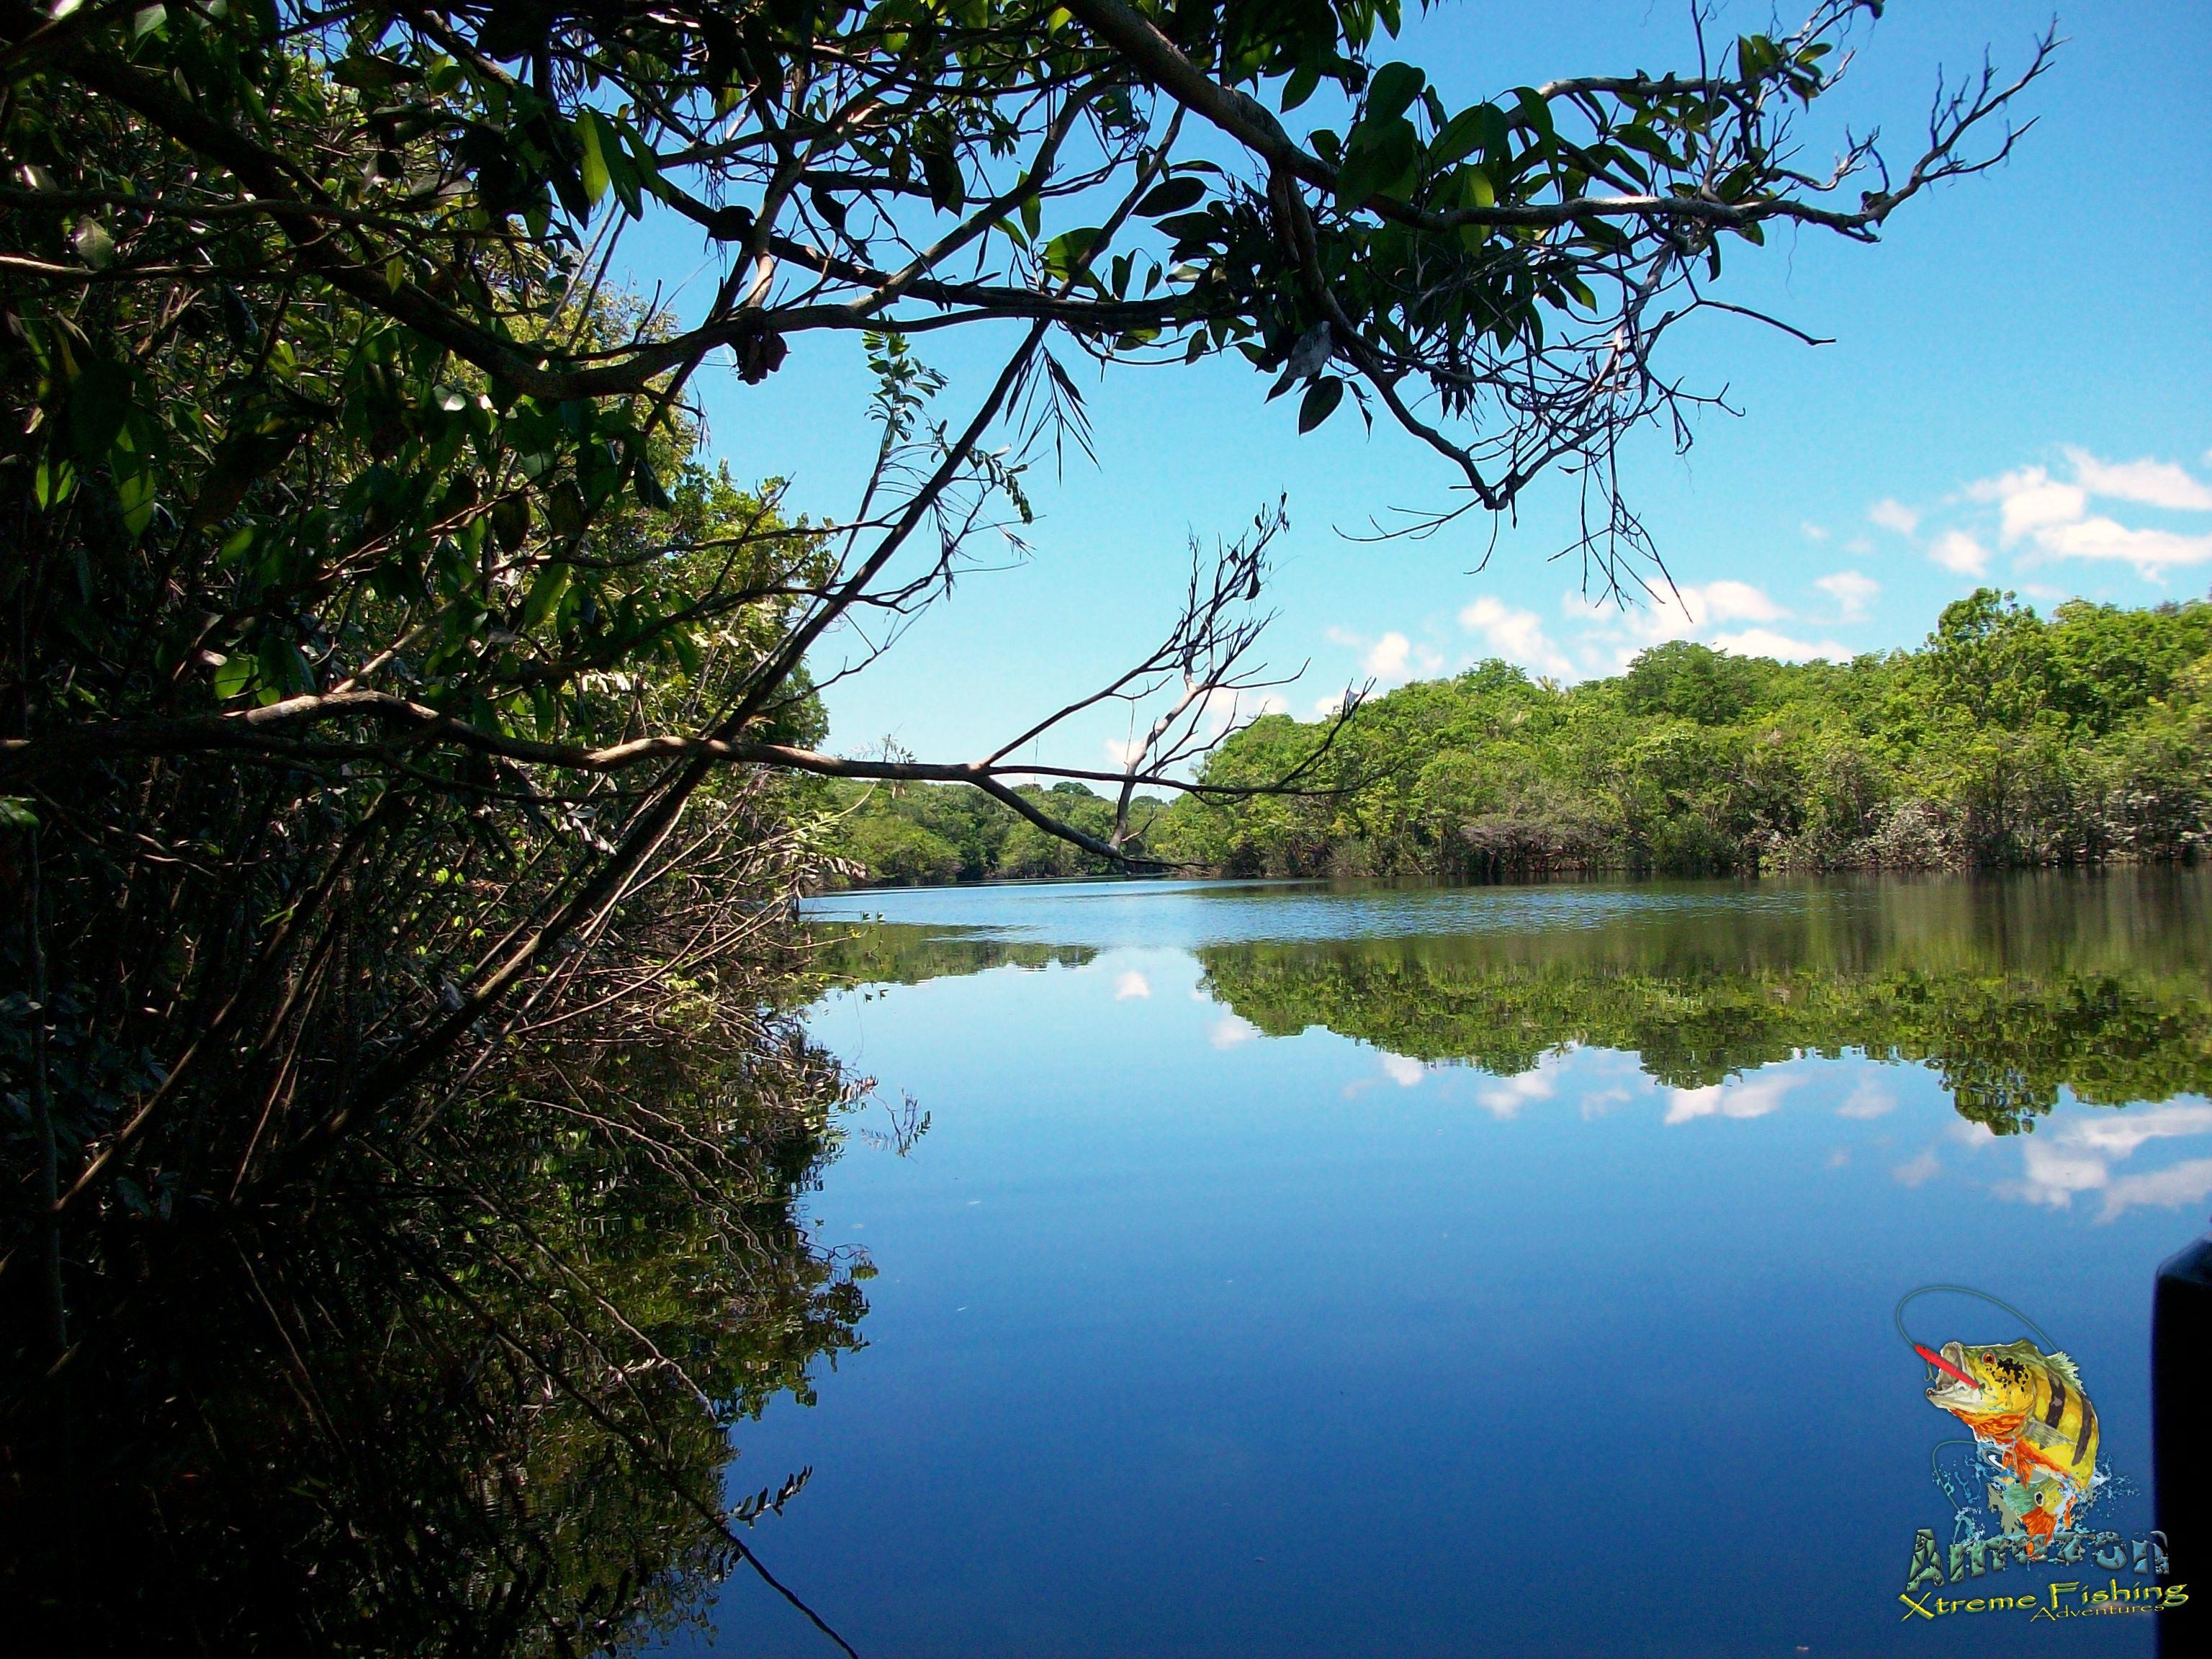 Life on the Rio Negro